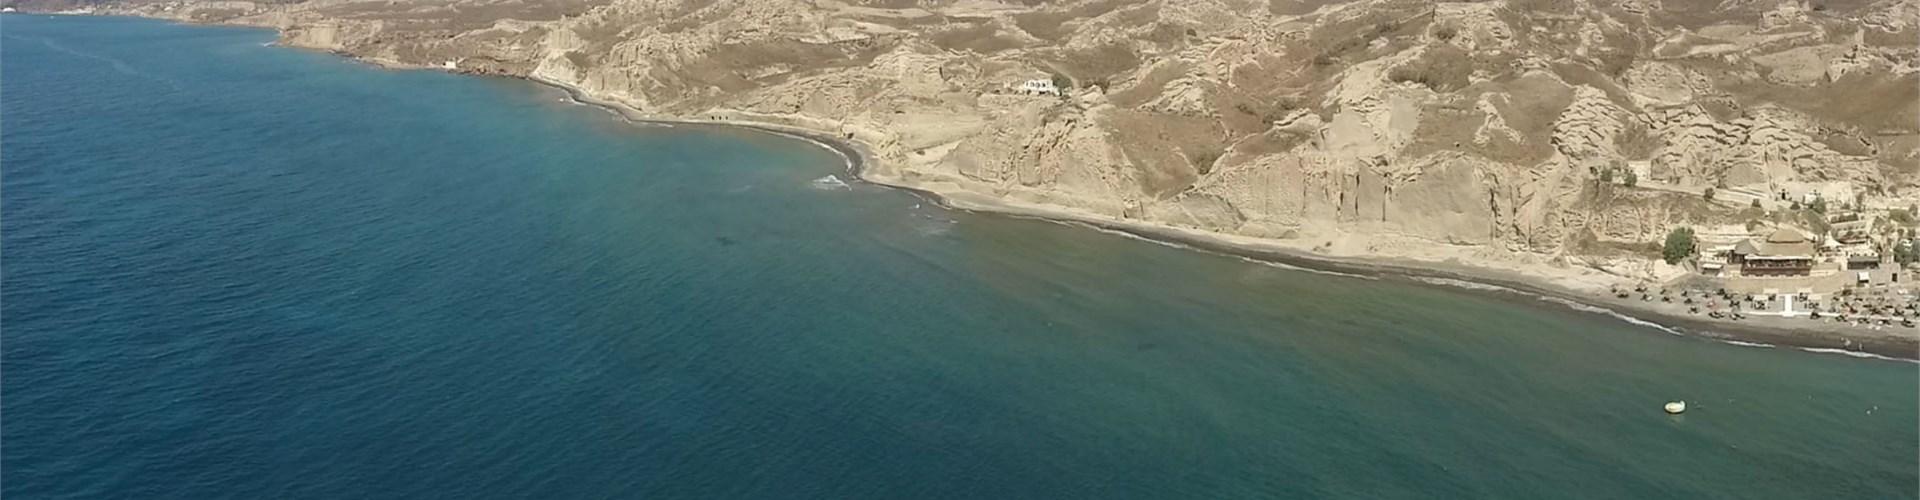 Almyra beach - Beaches - Santorini